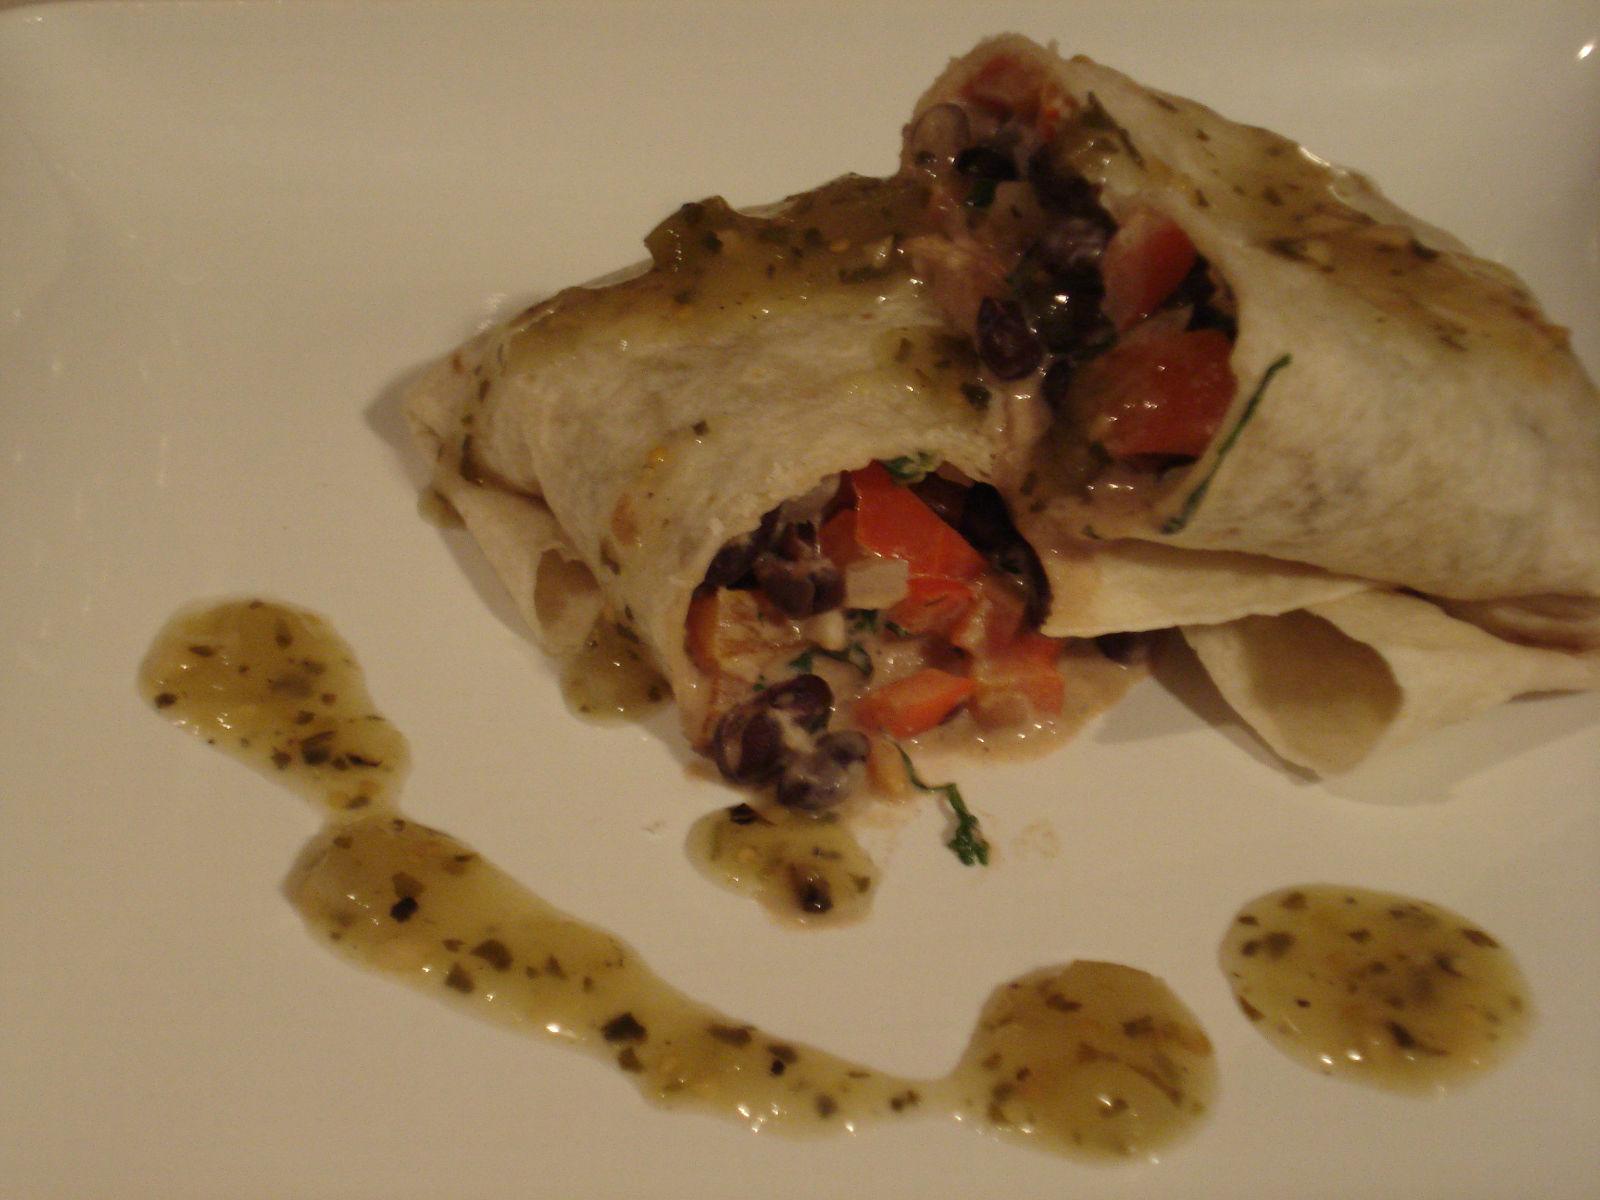 Black_Bean_Burrito_-_Picture_via_clefoodgoddess.com